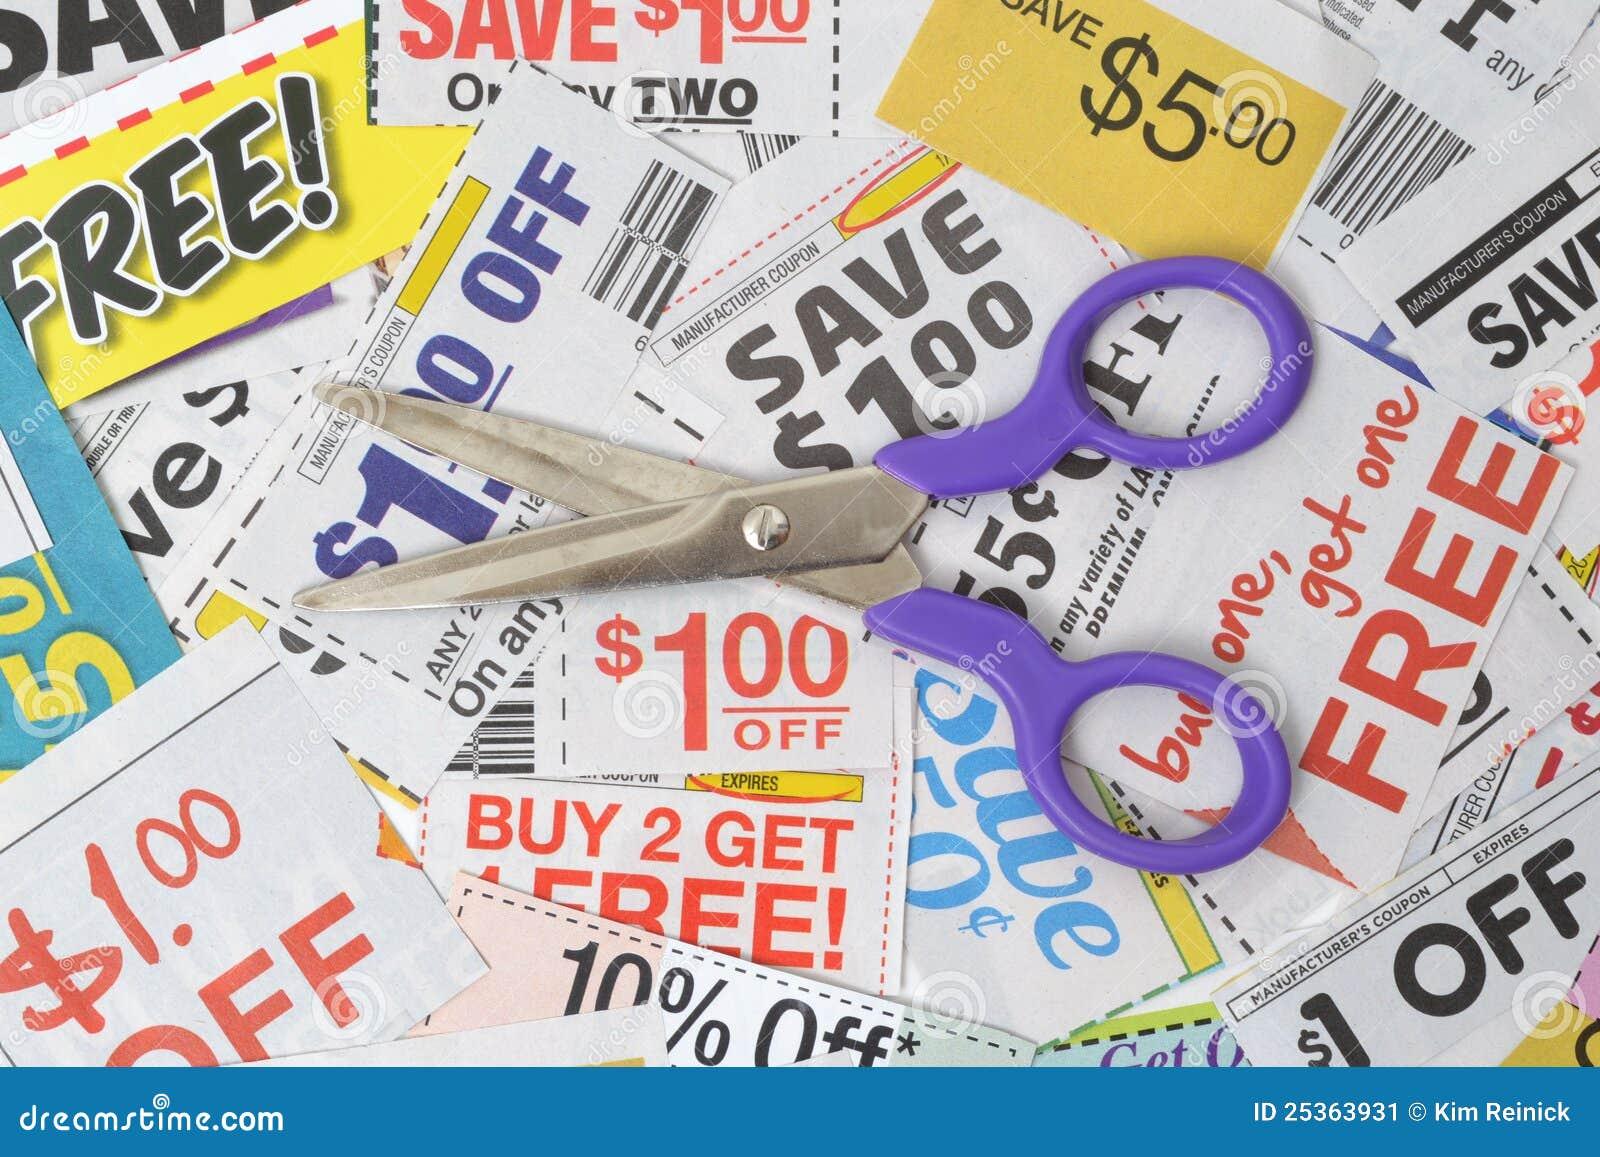 Etrade coupons